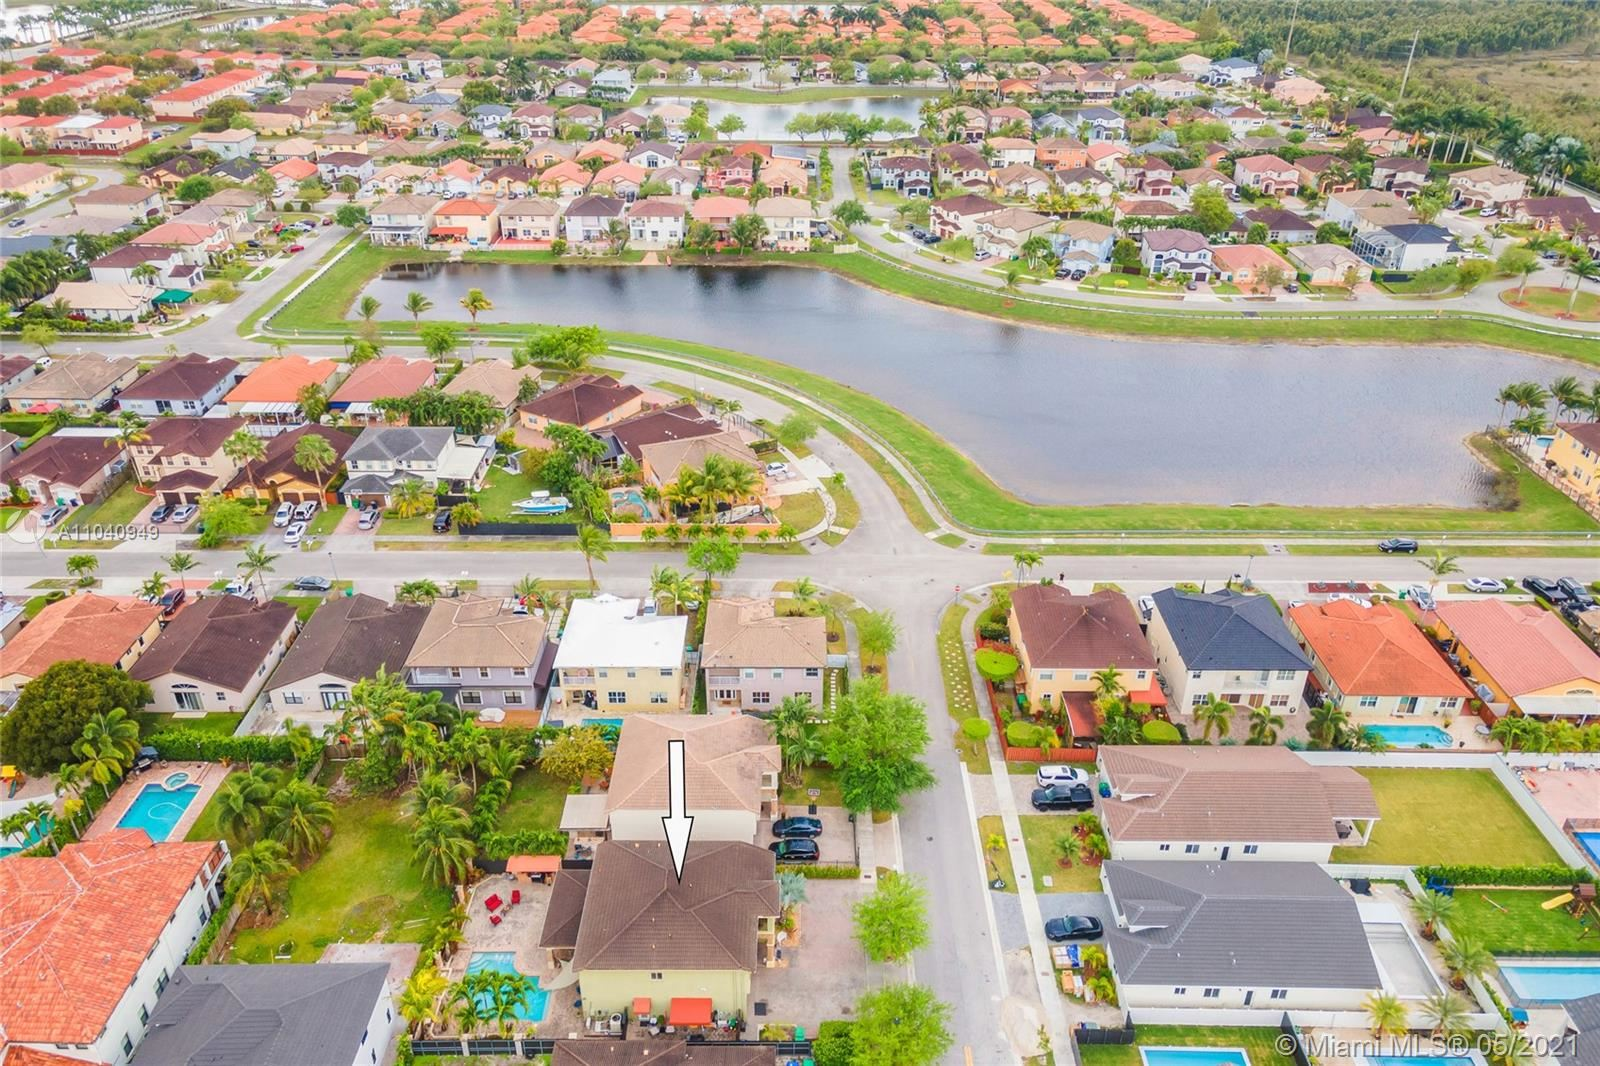 Photo of 2073 SW 155th Ave, Miami, FL 33185 (MLS # A11040949)